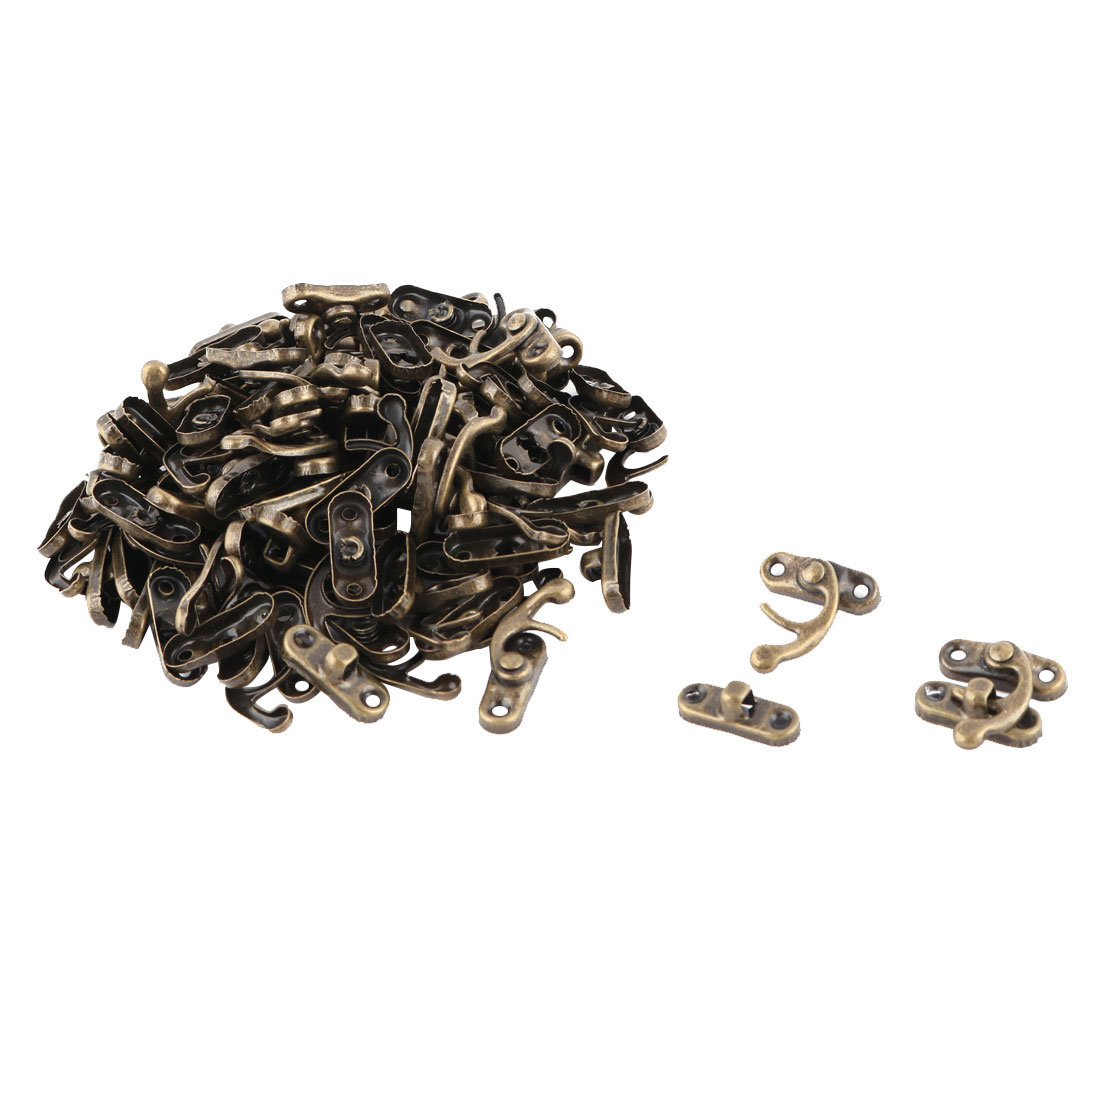 Metal Jewelry Box Bag Closure Hasp Lock Latch Buckle Clasp Bronze Tone 50pcs